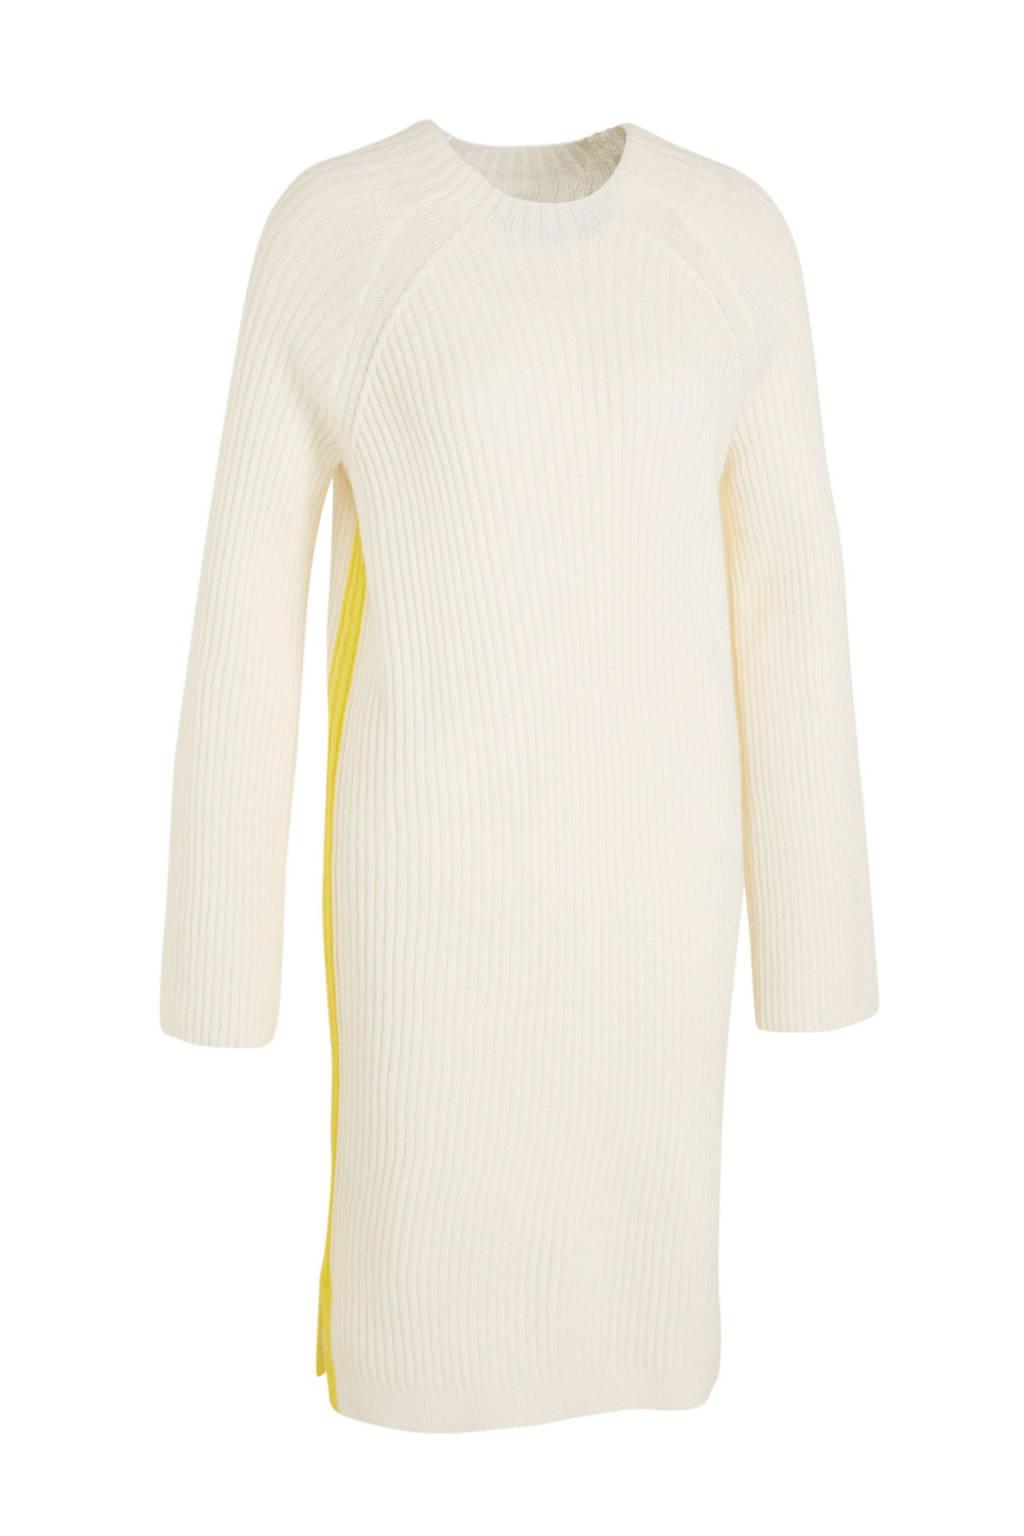 C&A Yessica jurk met contrastbies ecru/geel, Ecru/geel